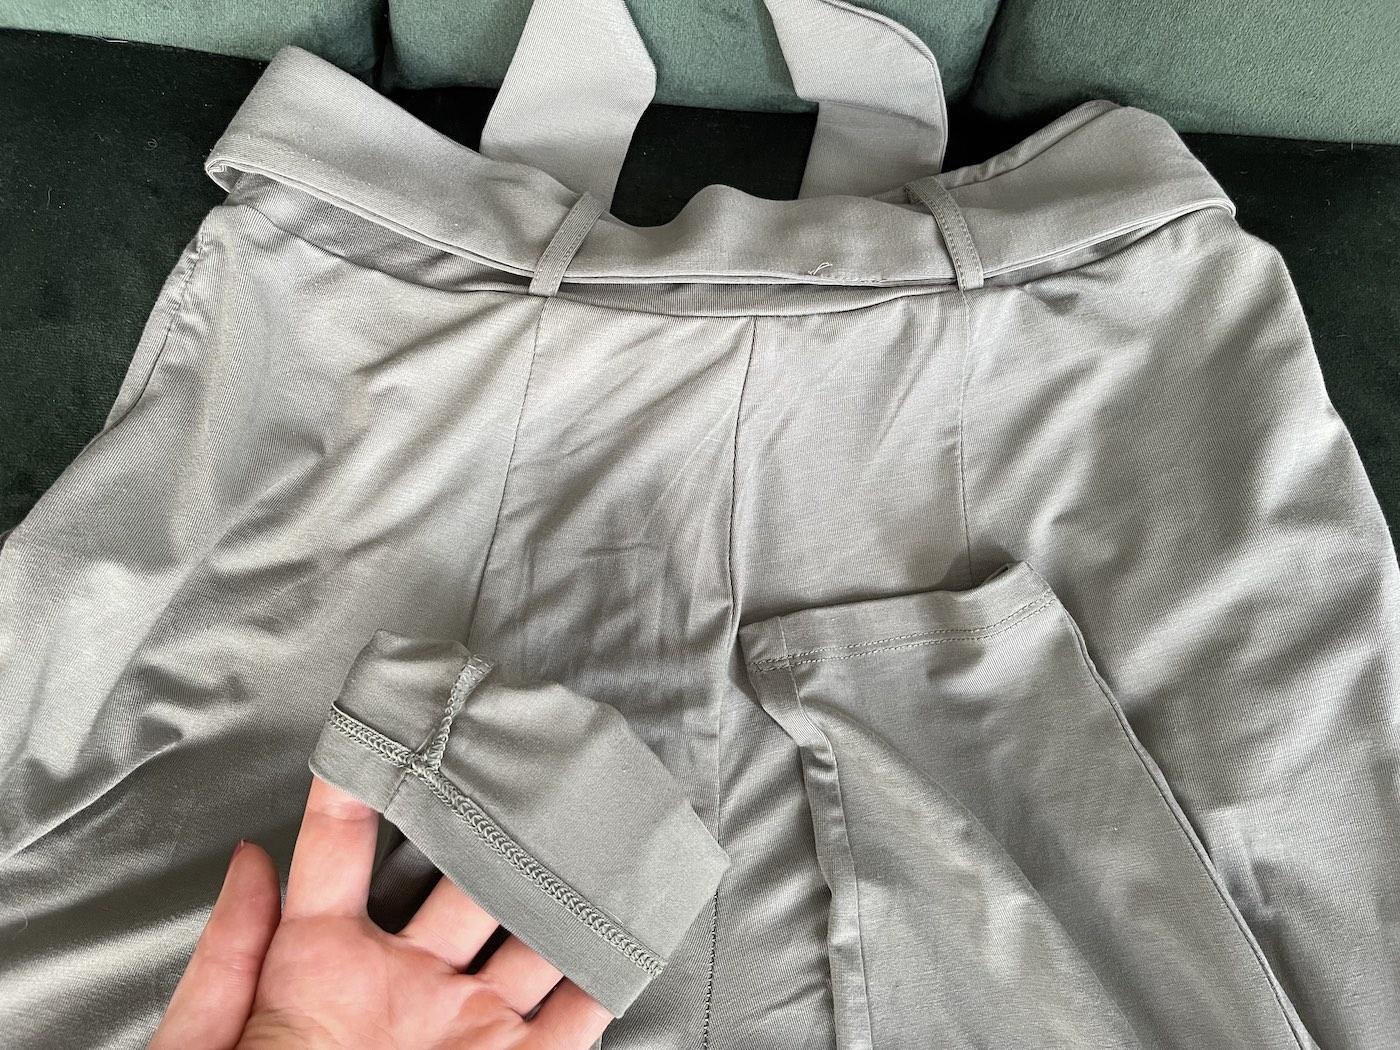 The Jade Pants Les Lunes Erfahrungen Bein Saum Nähte Qualität Nahansicht